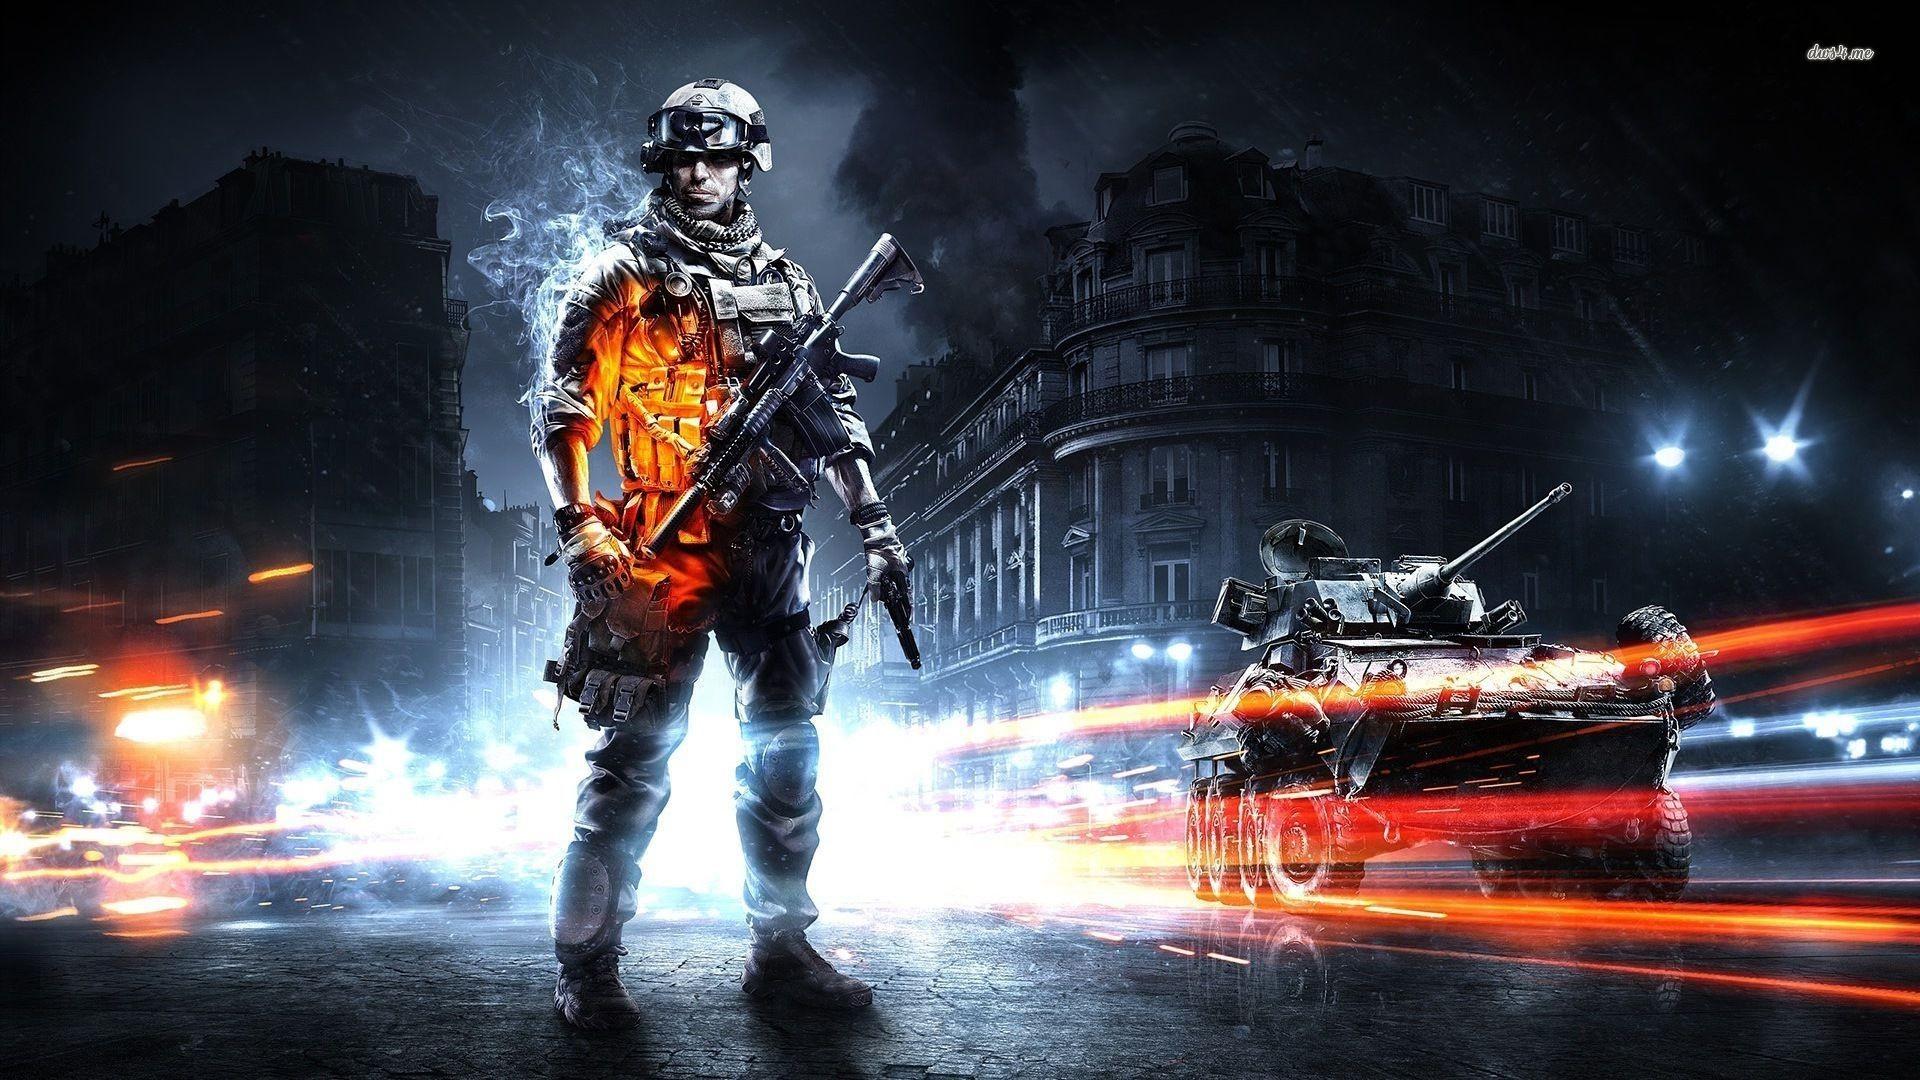 Acheter Battlefield Premium jeu inclus all DLC